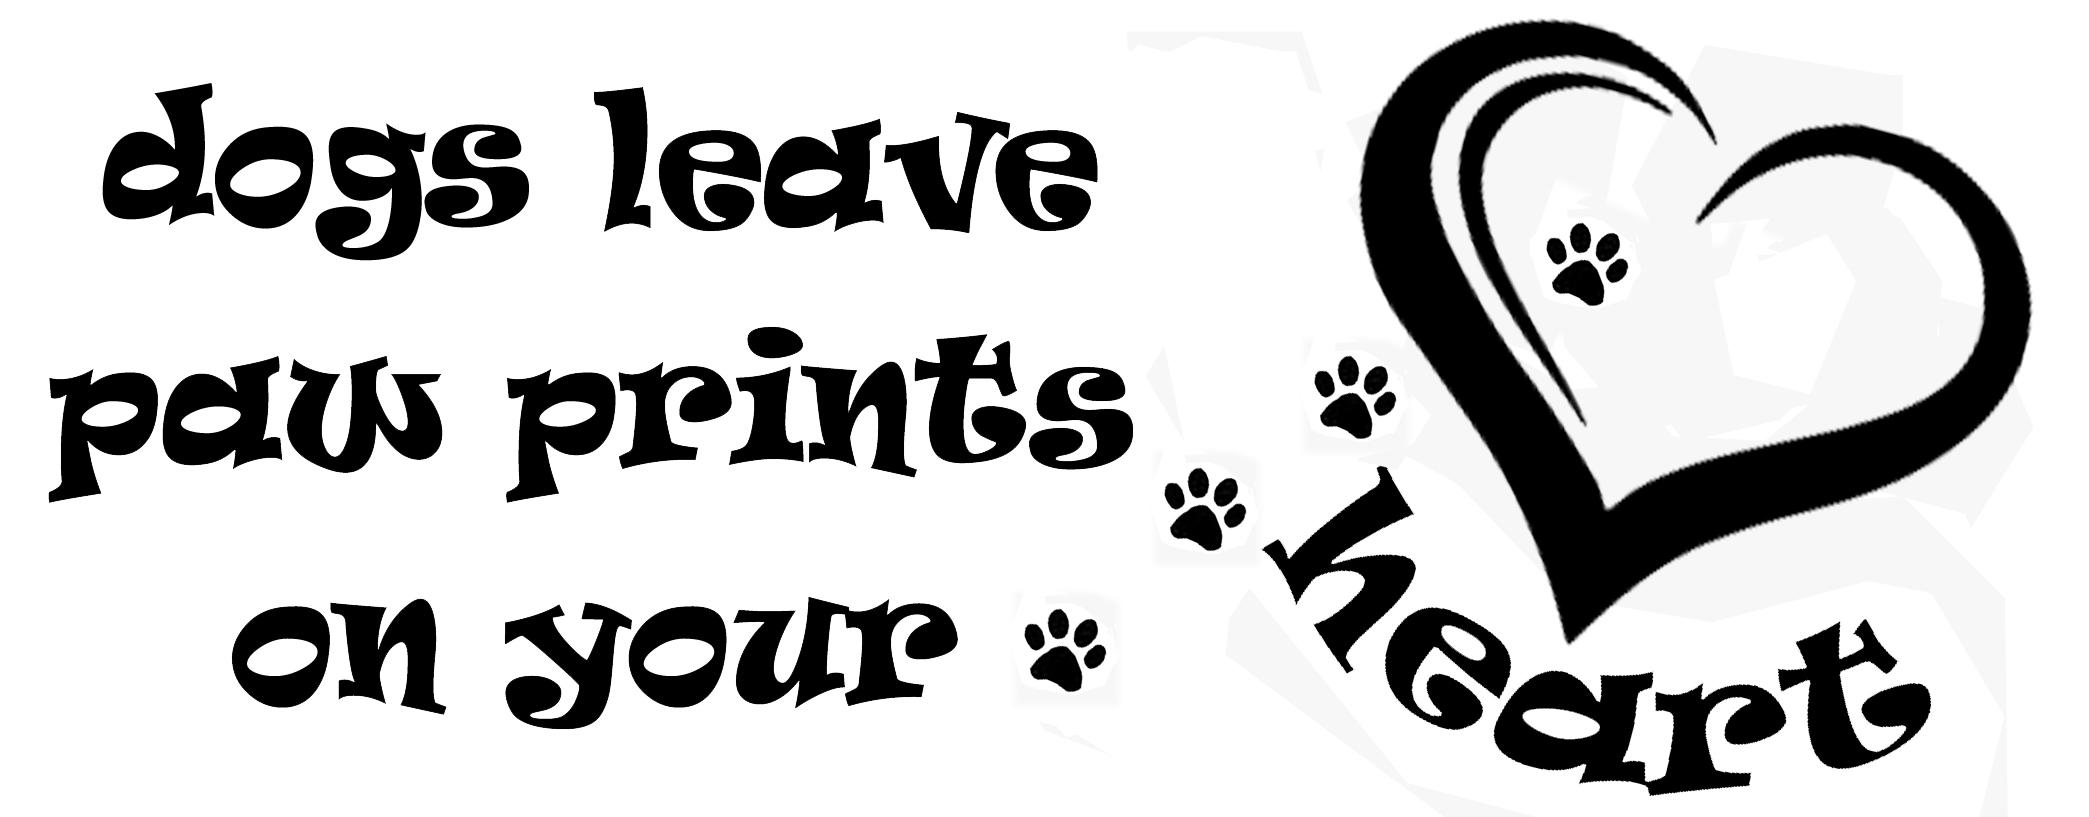 PET8: Dog leaves paw print